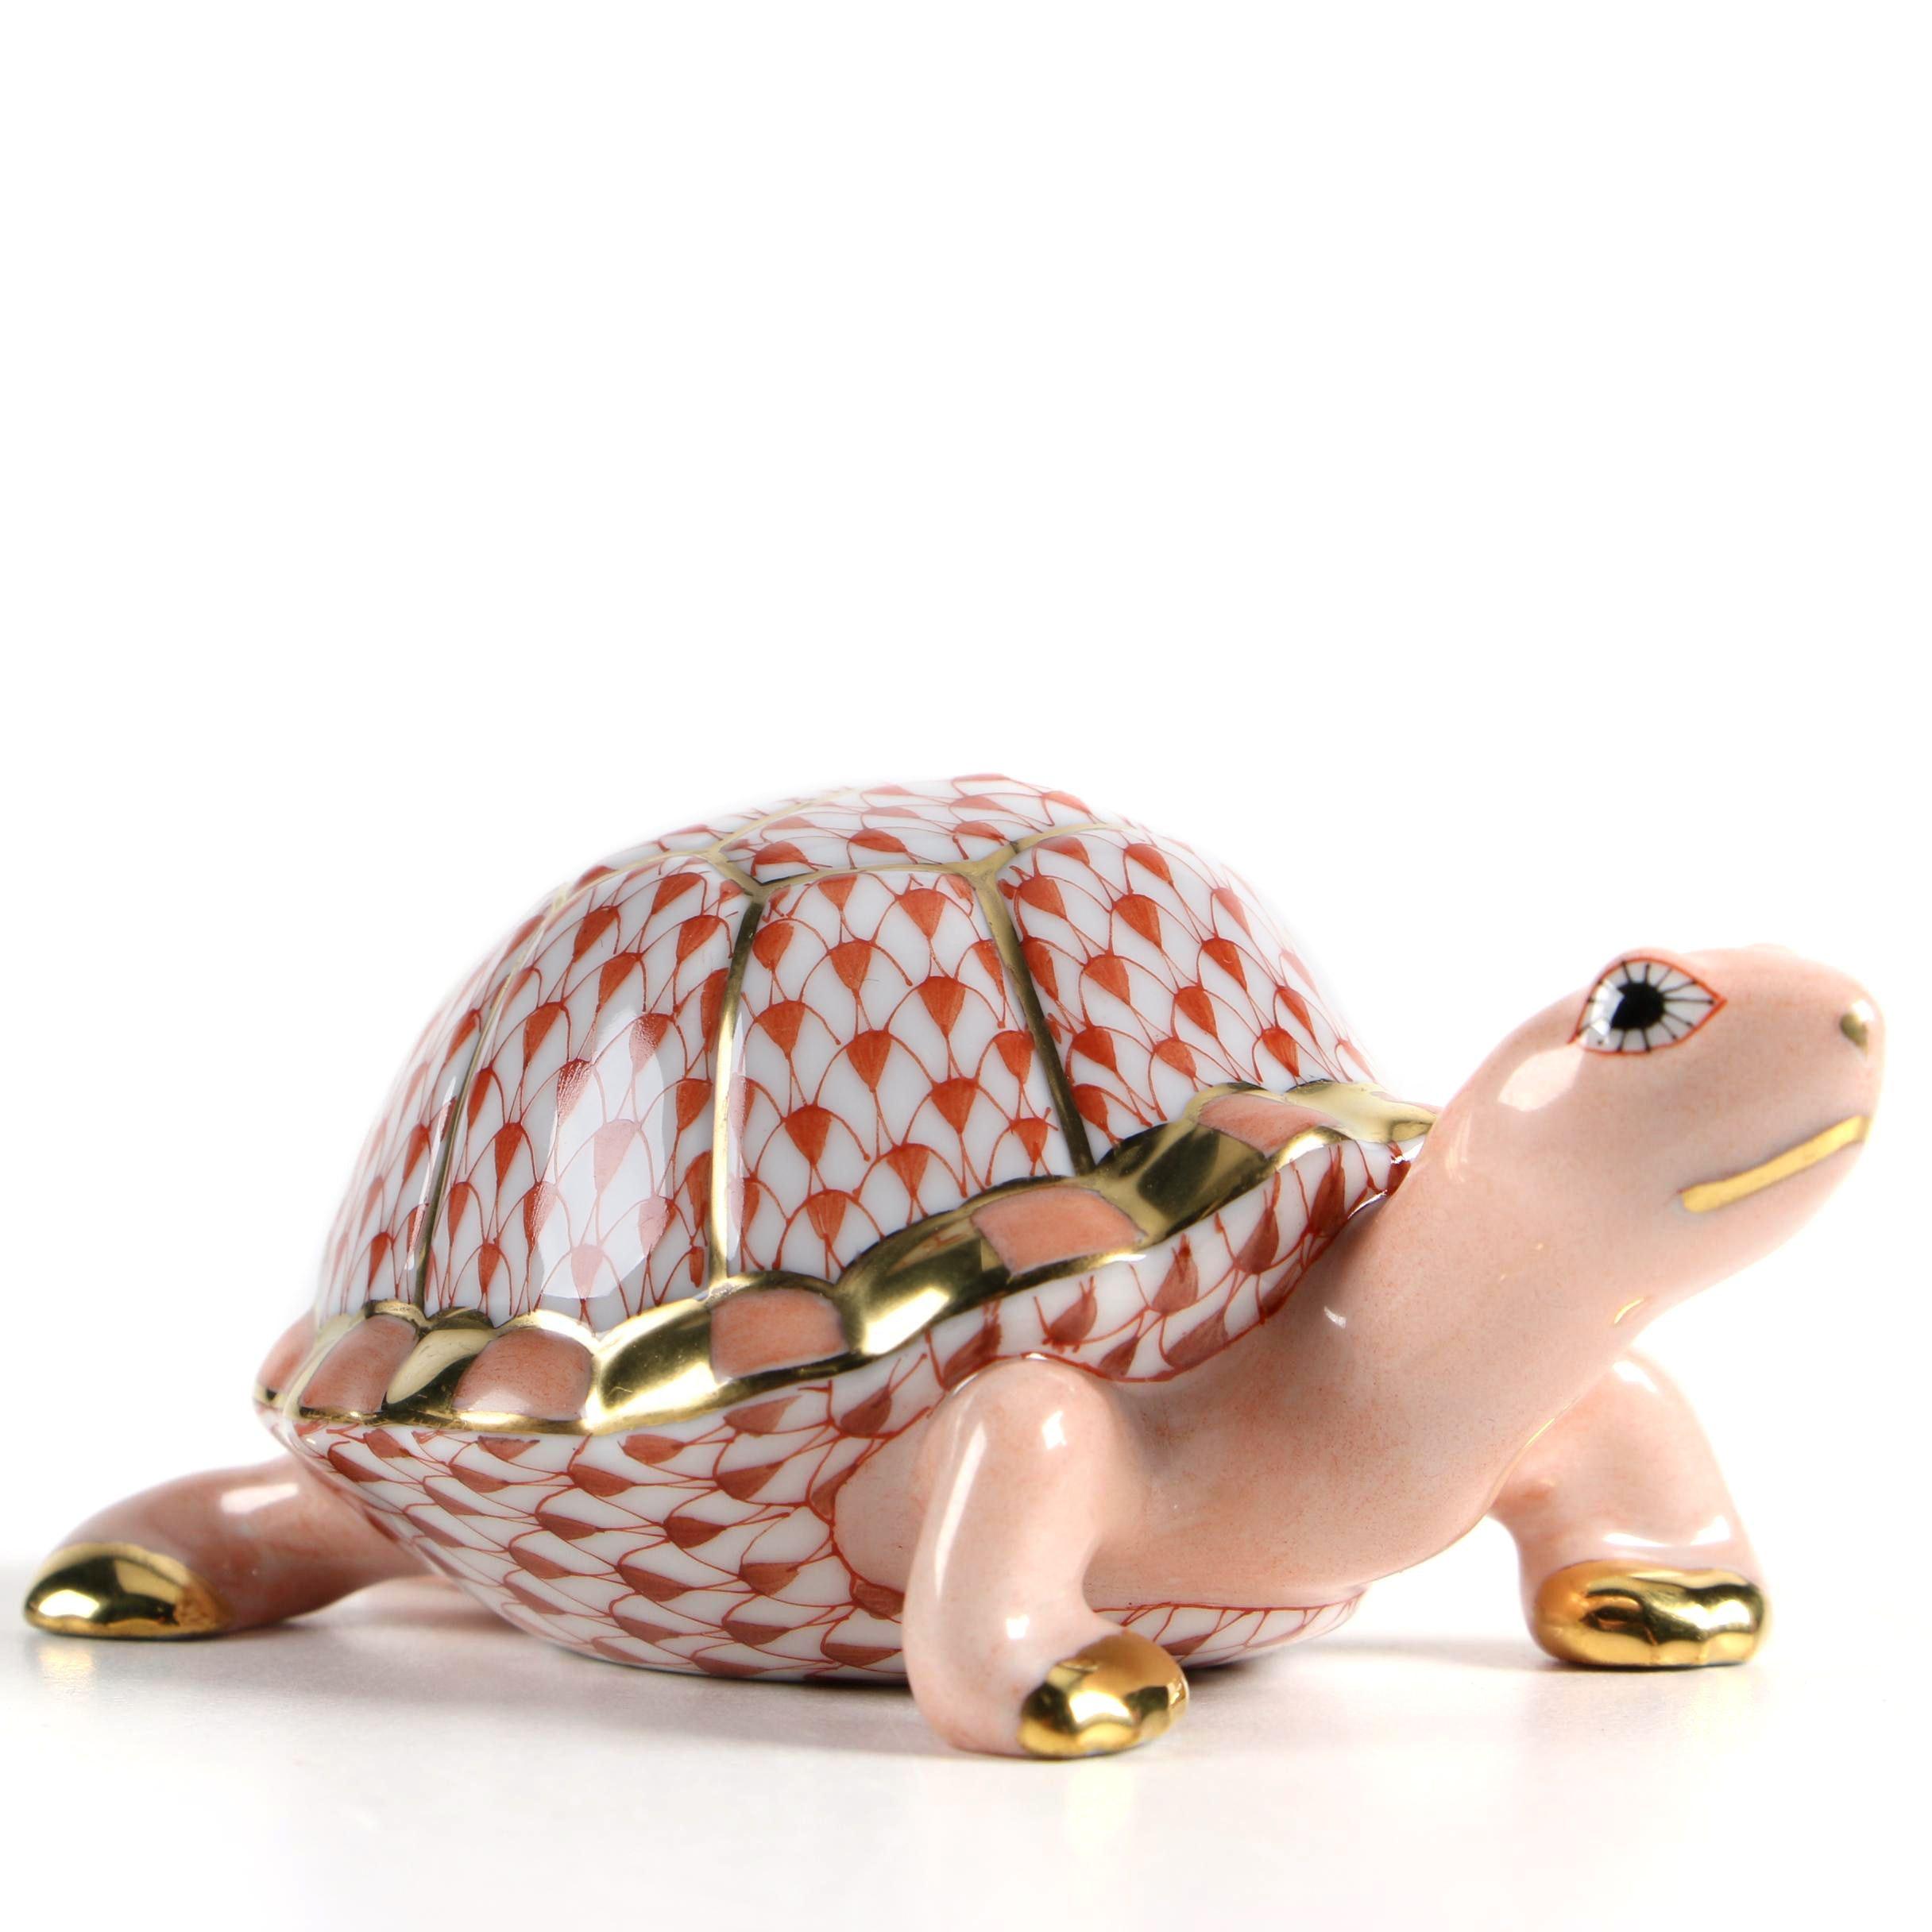 "Herend Hungary ""Box Turtle"" Hand-Painted Porcelain Figurine"